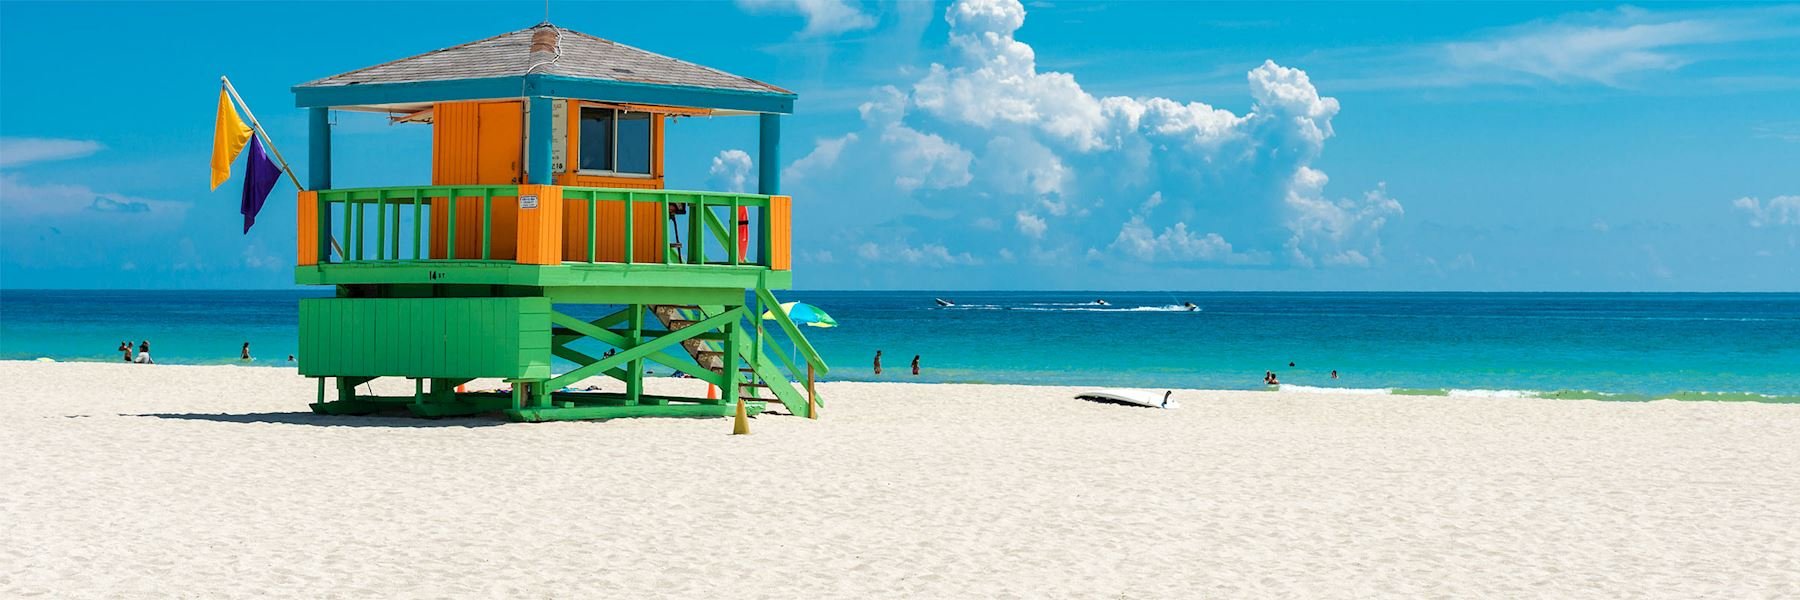 Visit Miami, USA